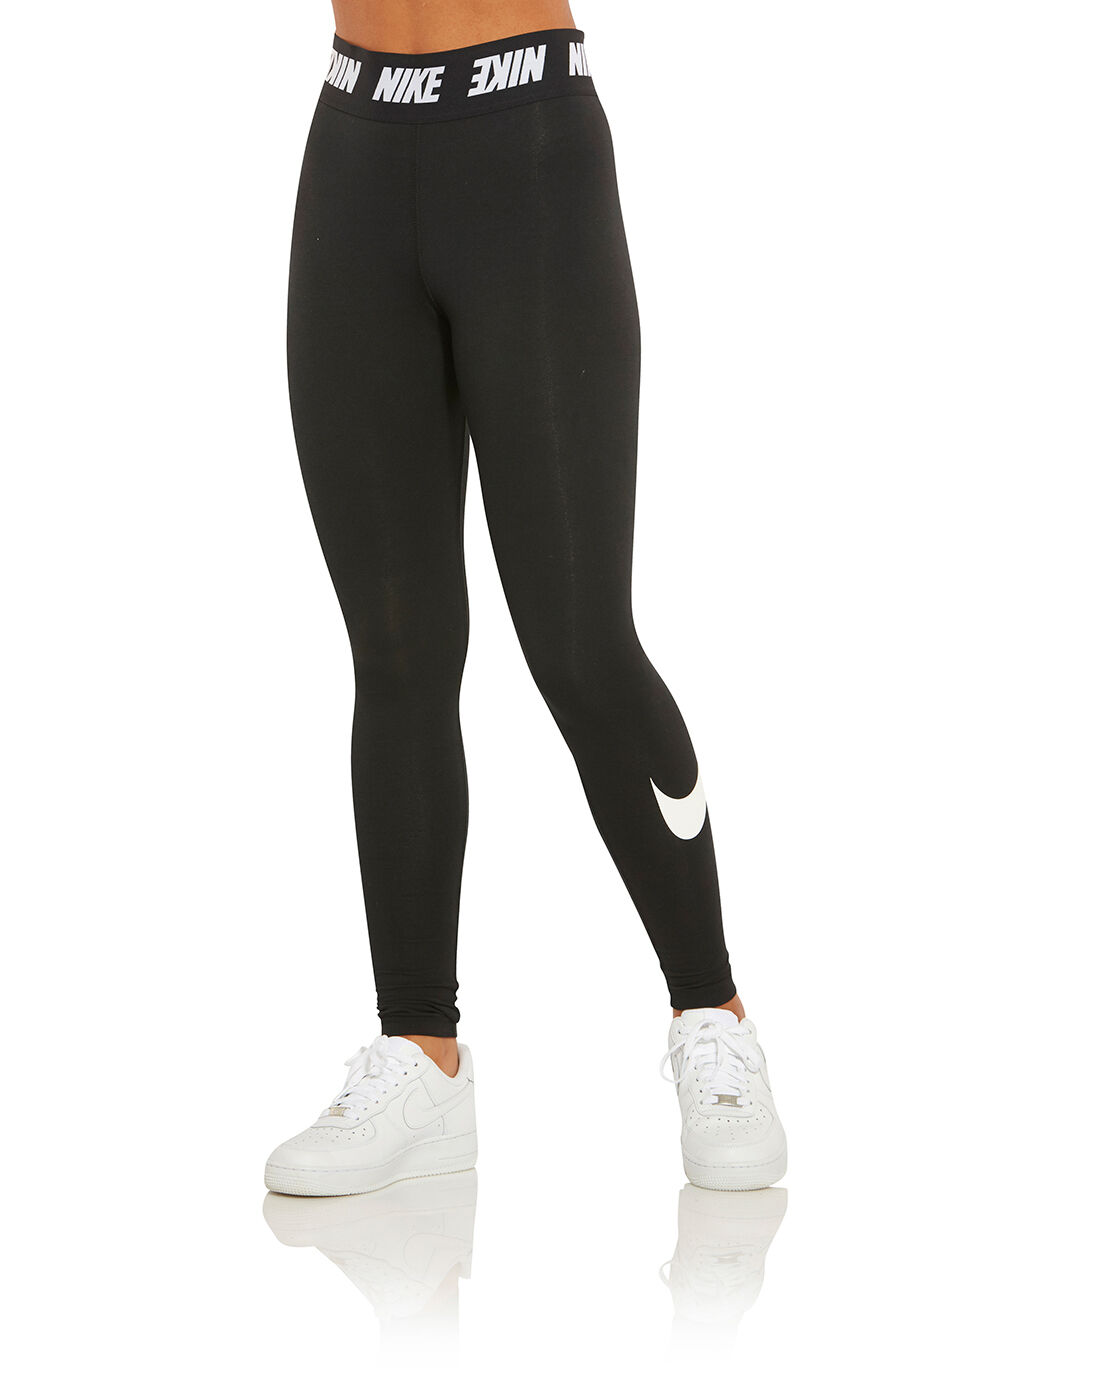 Nike Womens High Waist Club Leggings